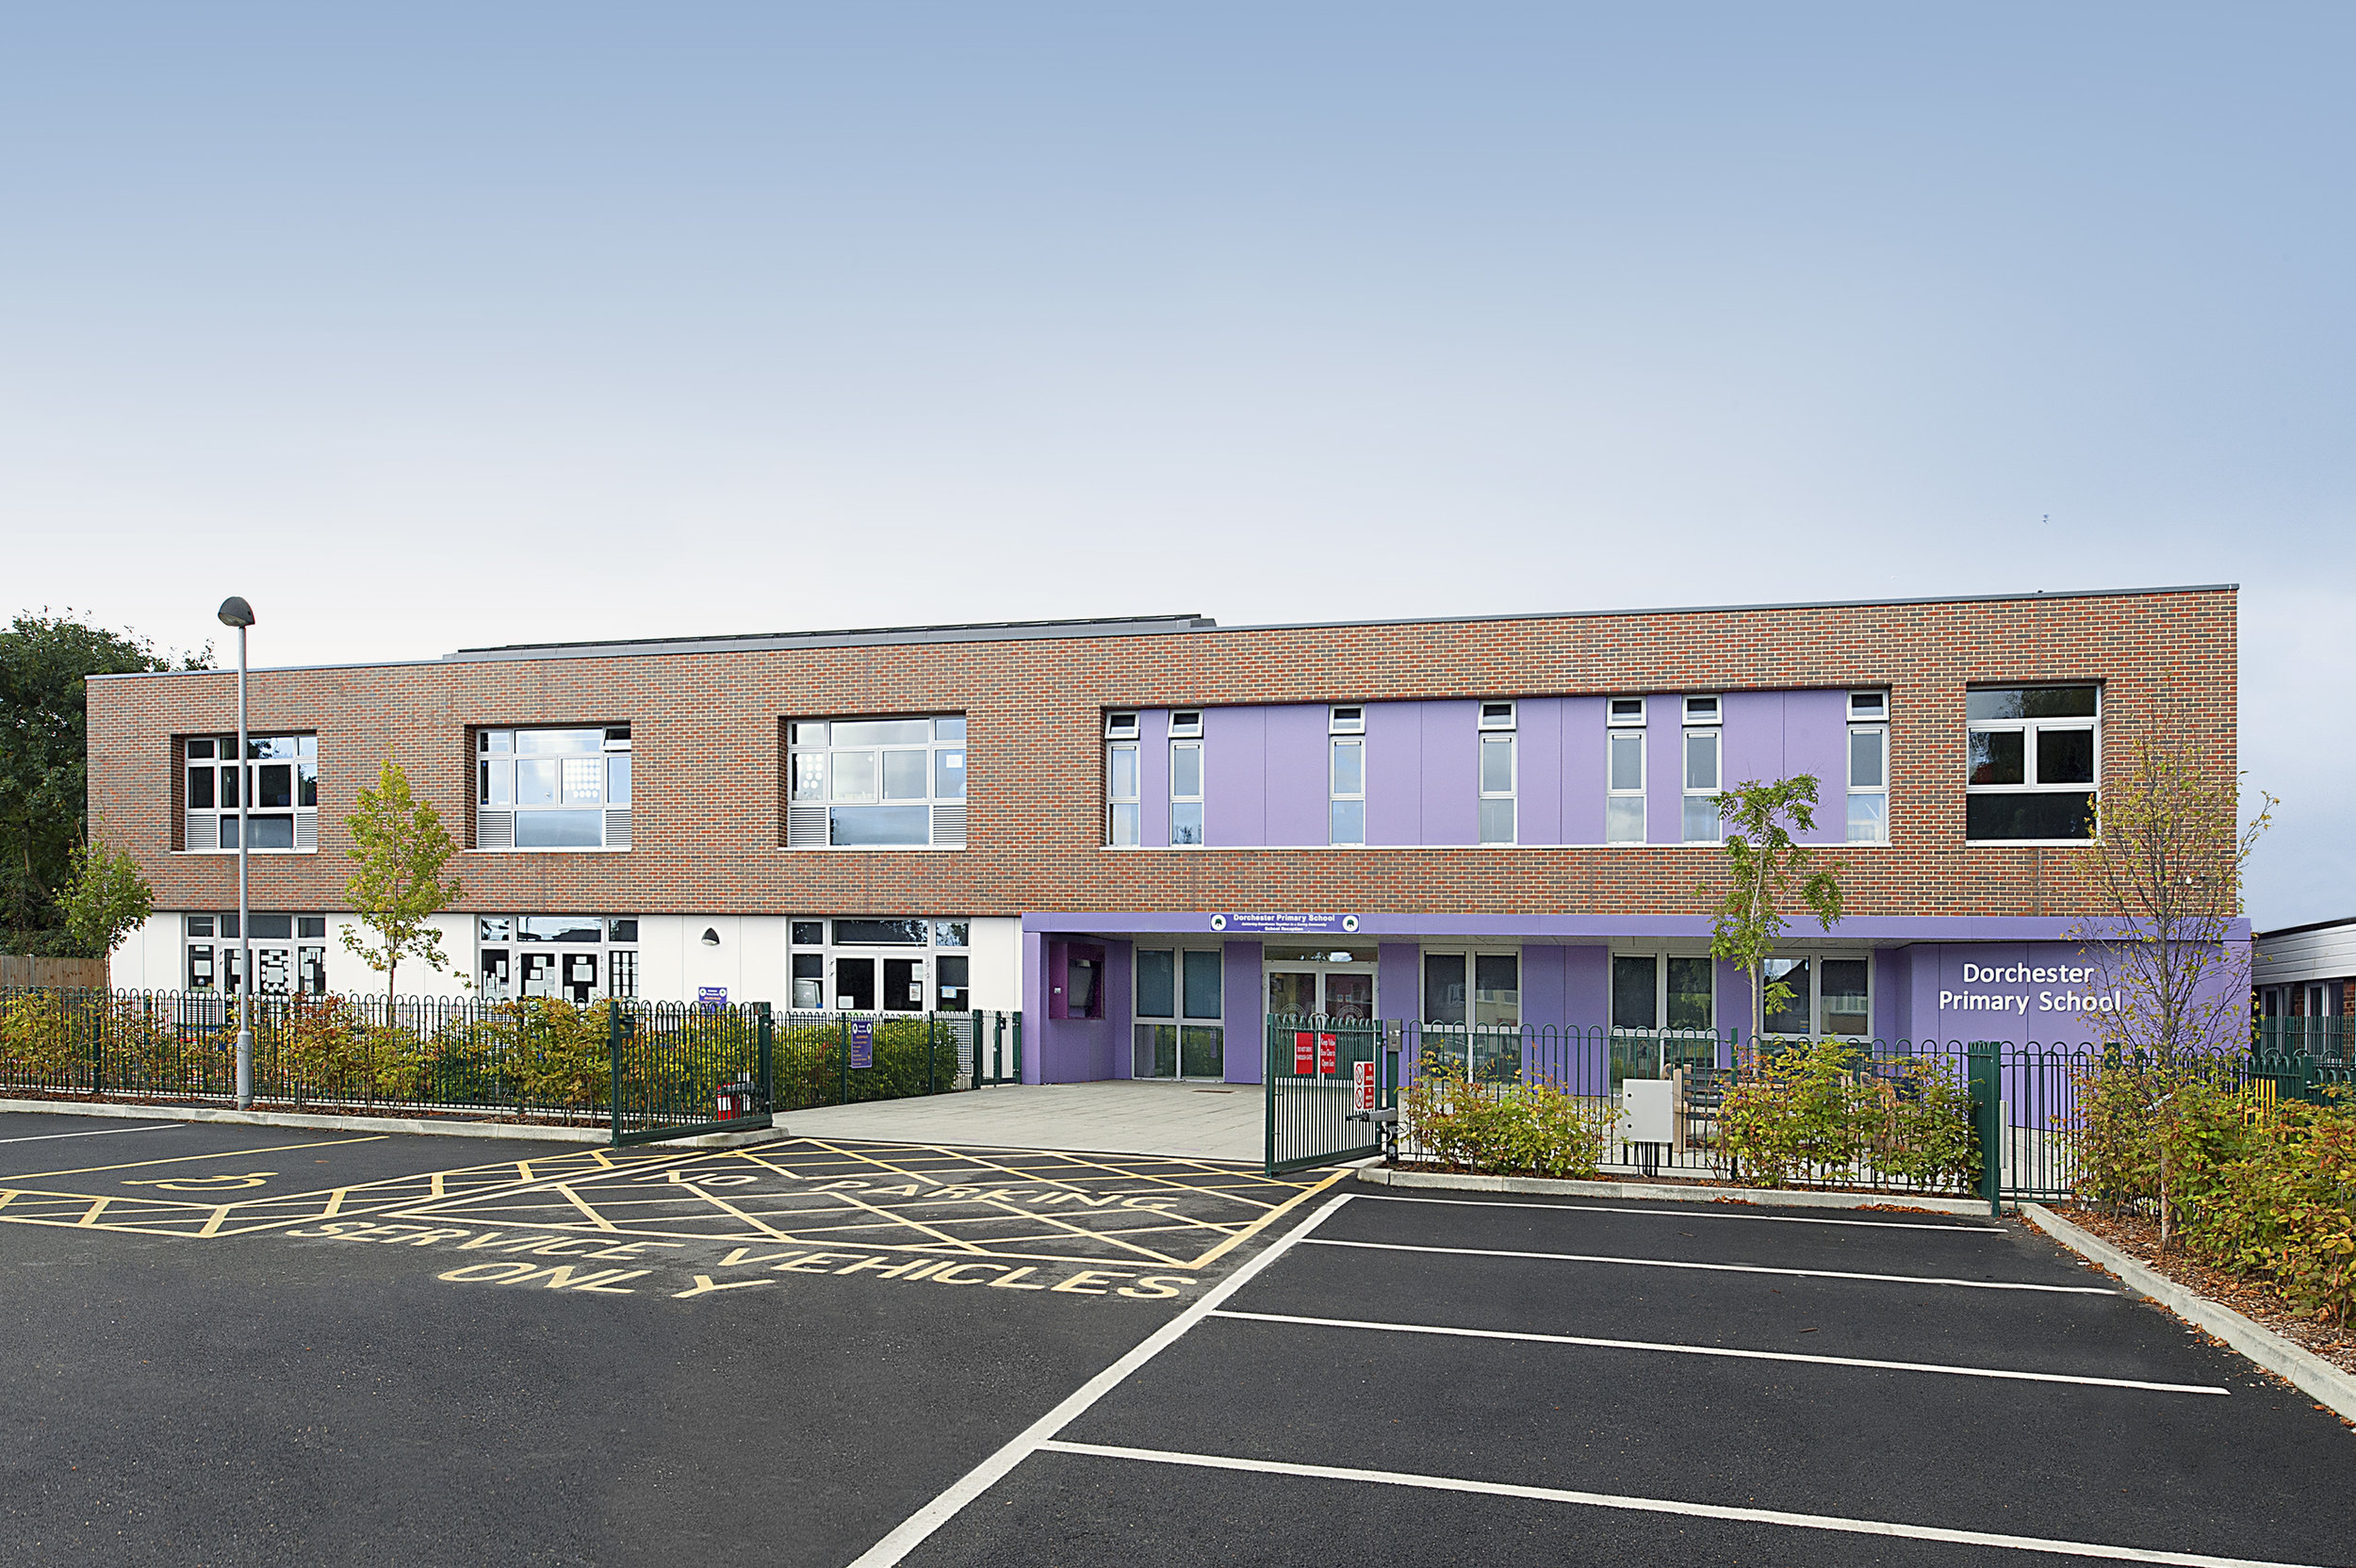 Dorchester Primary School Surrey    Read our case study